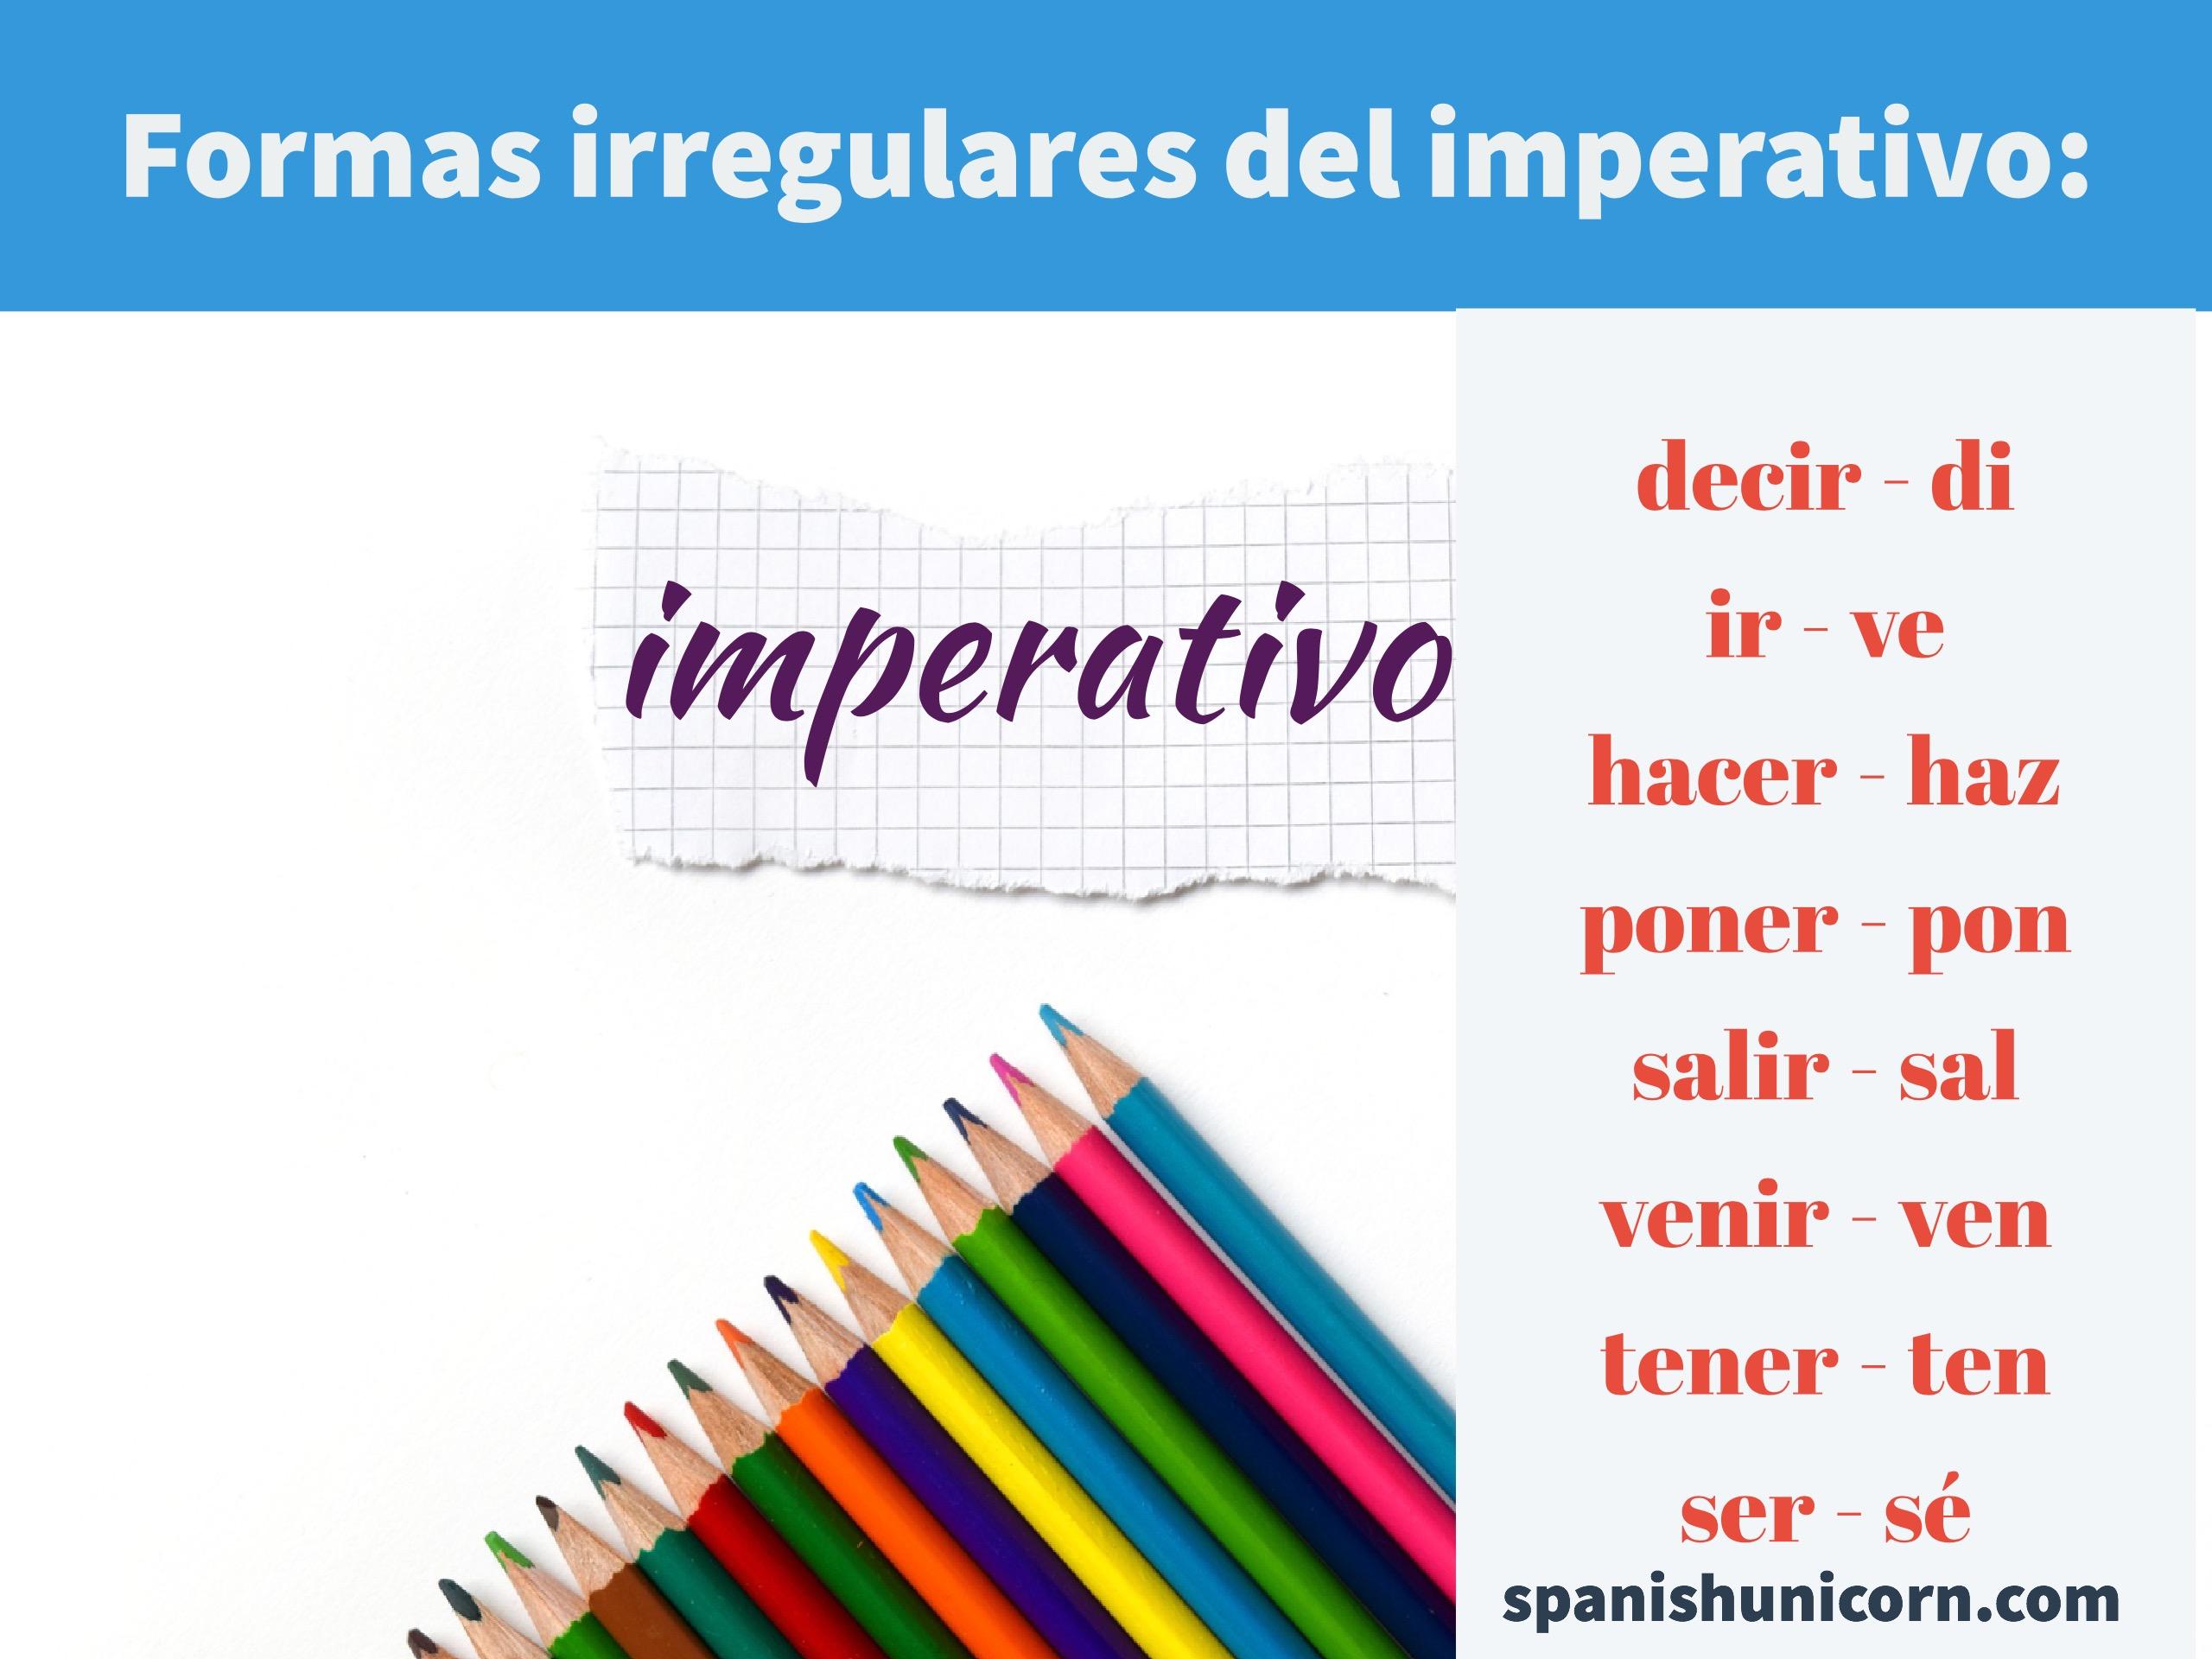 formas irregulares del imperativo